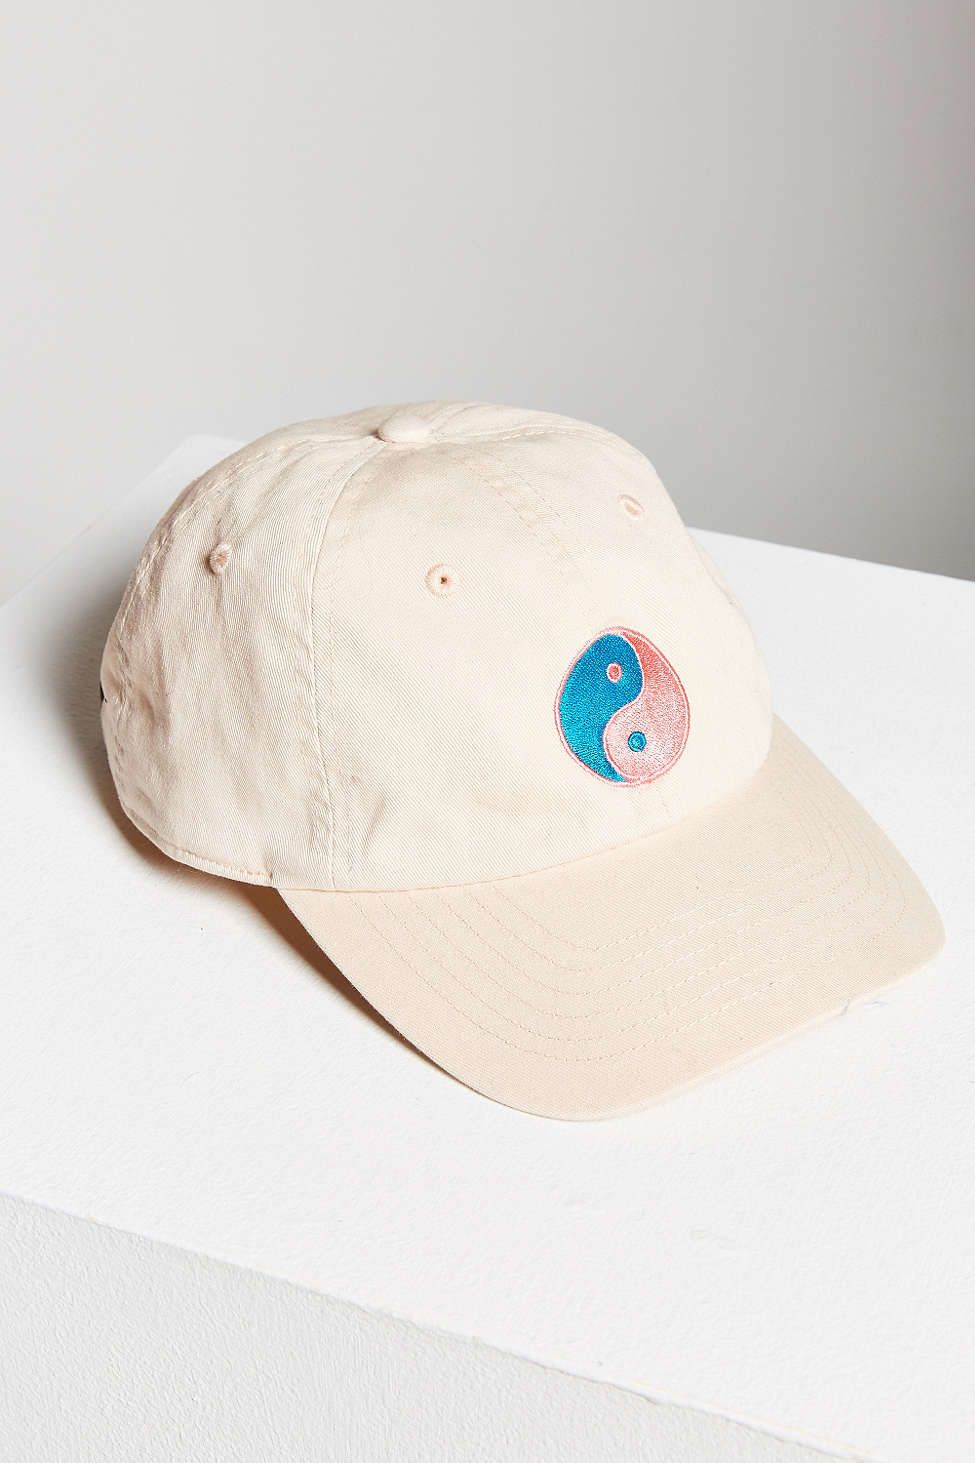 Yin Yang Baseball Hats Cute Caps Hats